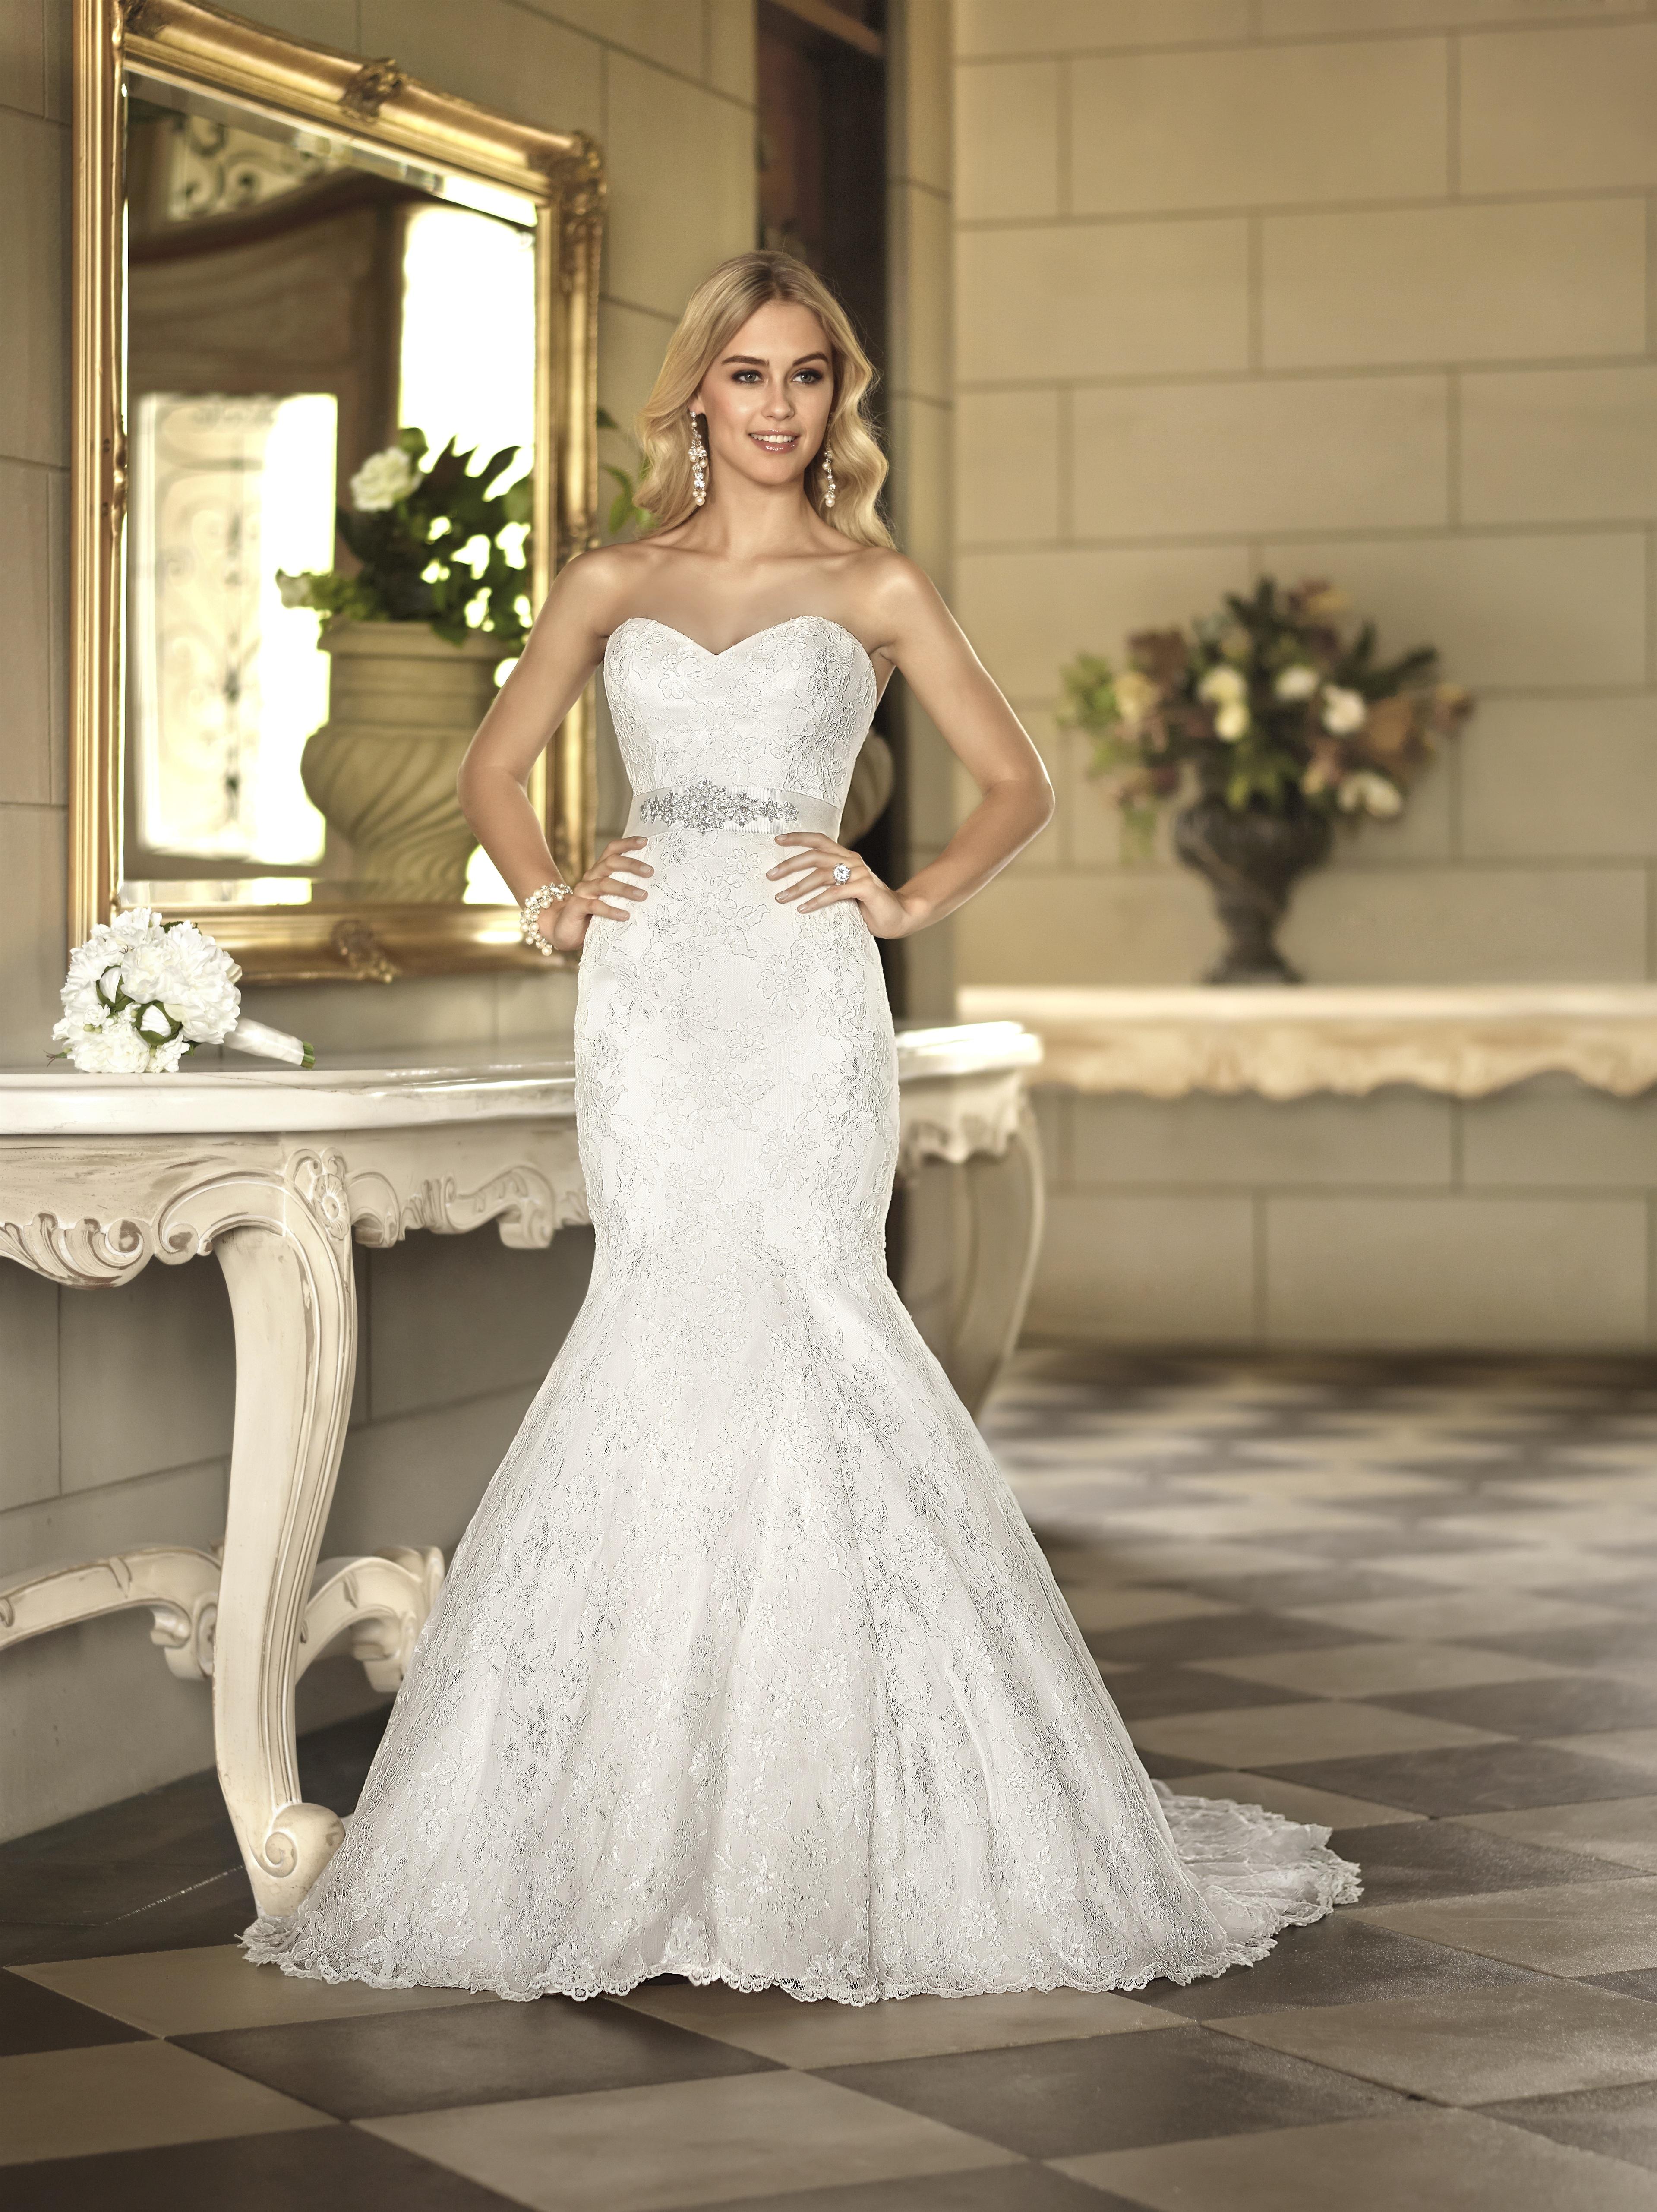 Wedding Dresses Oklahoma City. Beautiful Off Rack Wedding Dresses ...